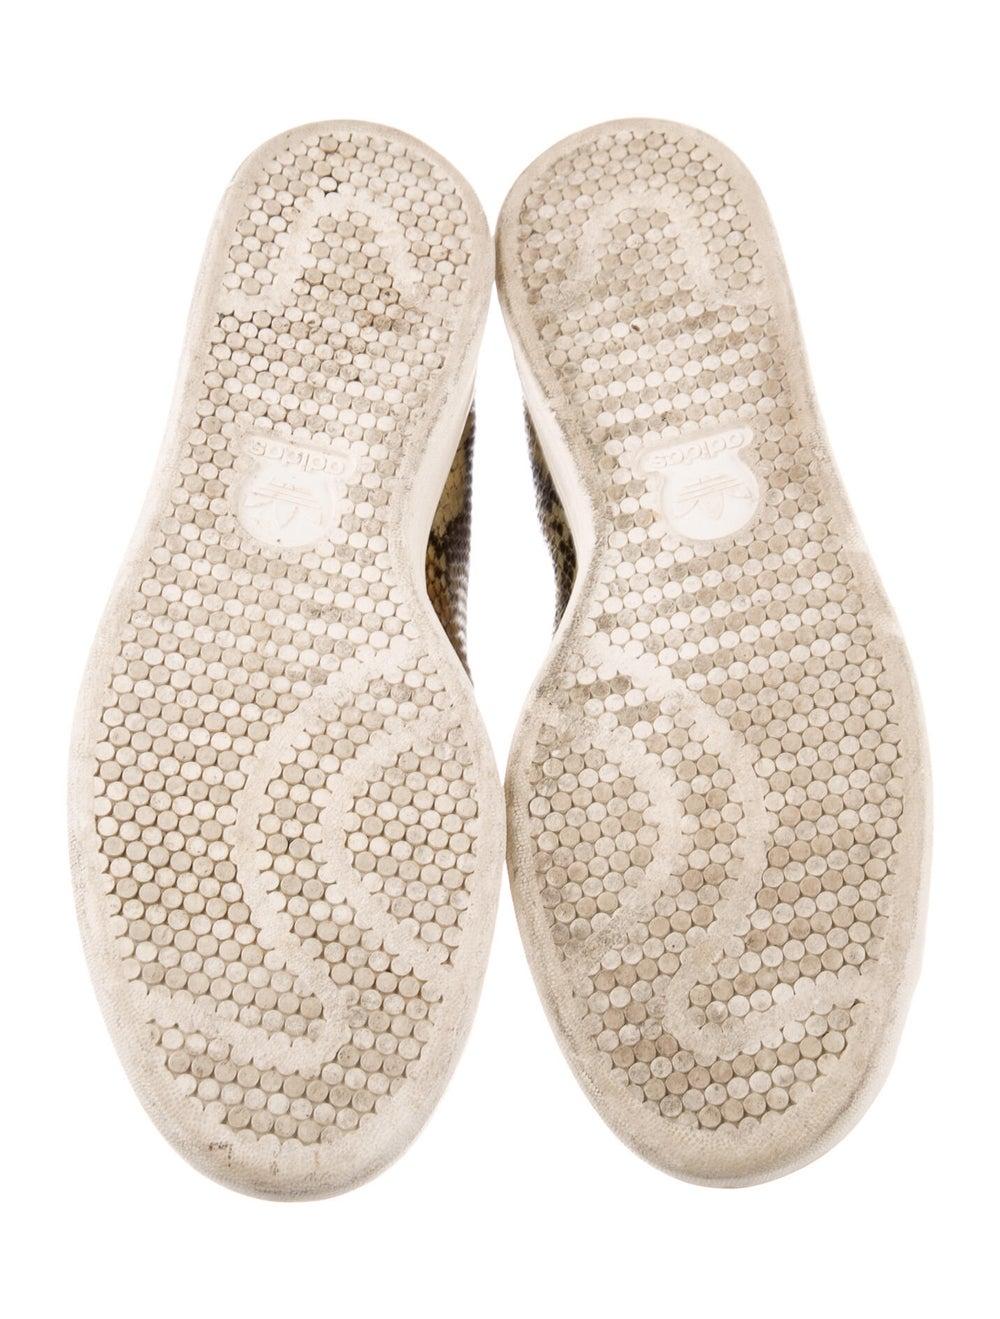 Adidas Stan Smith Mid Sneakers White - image 5